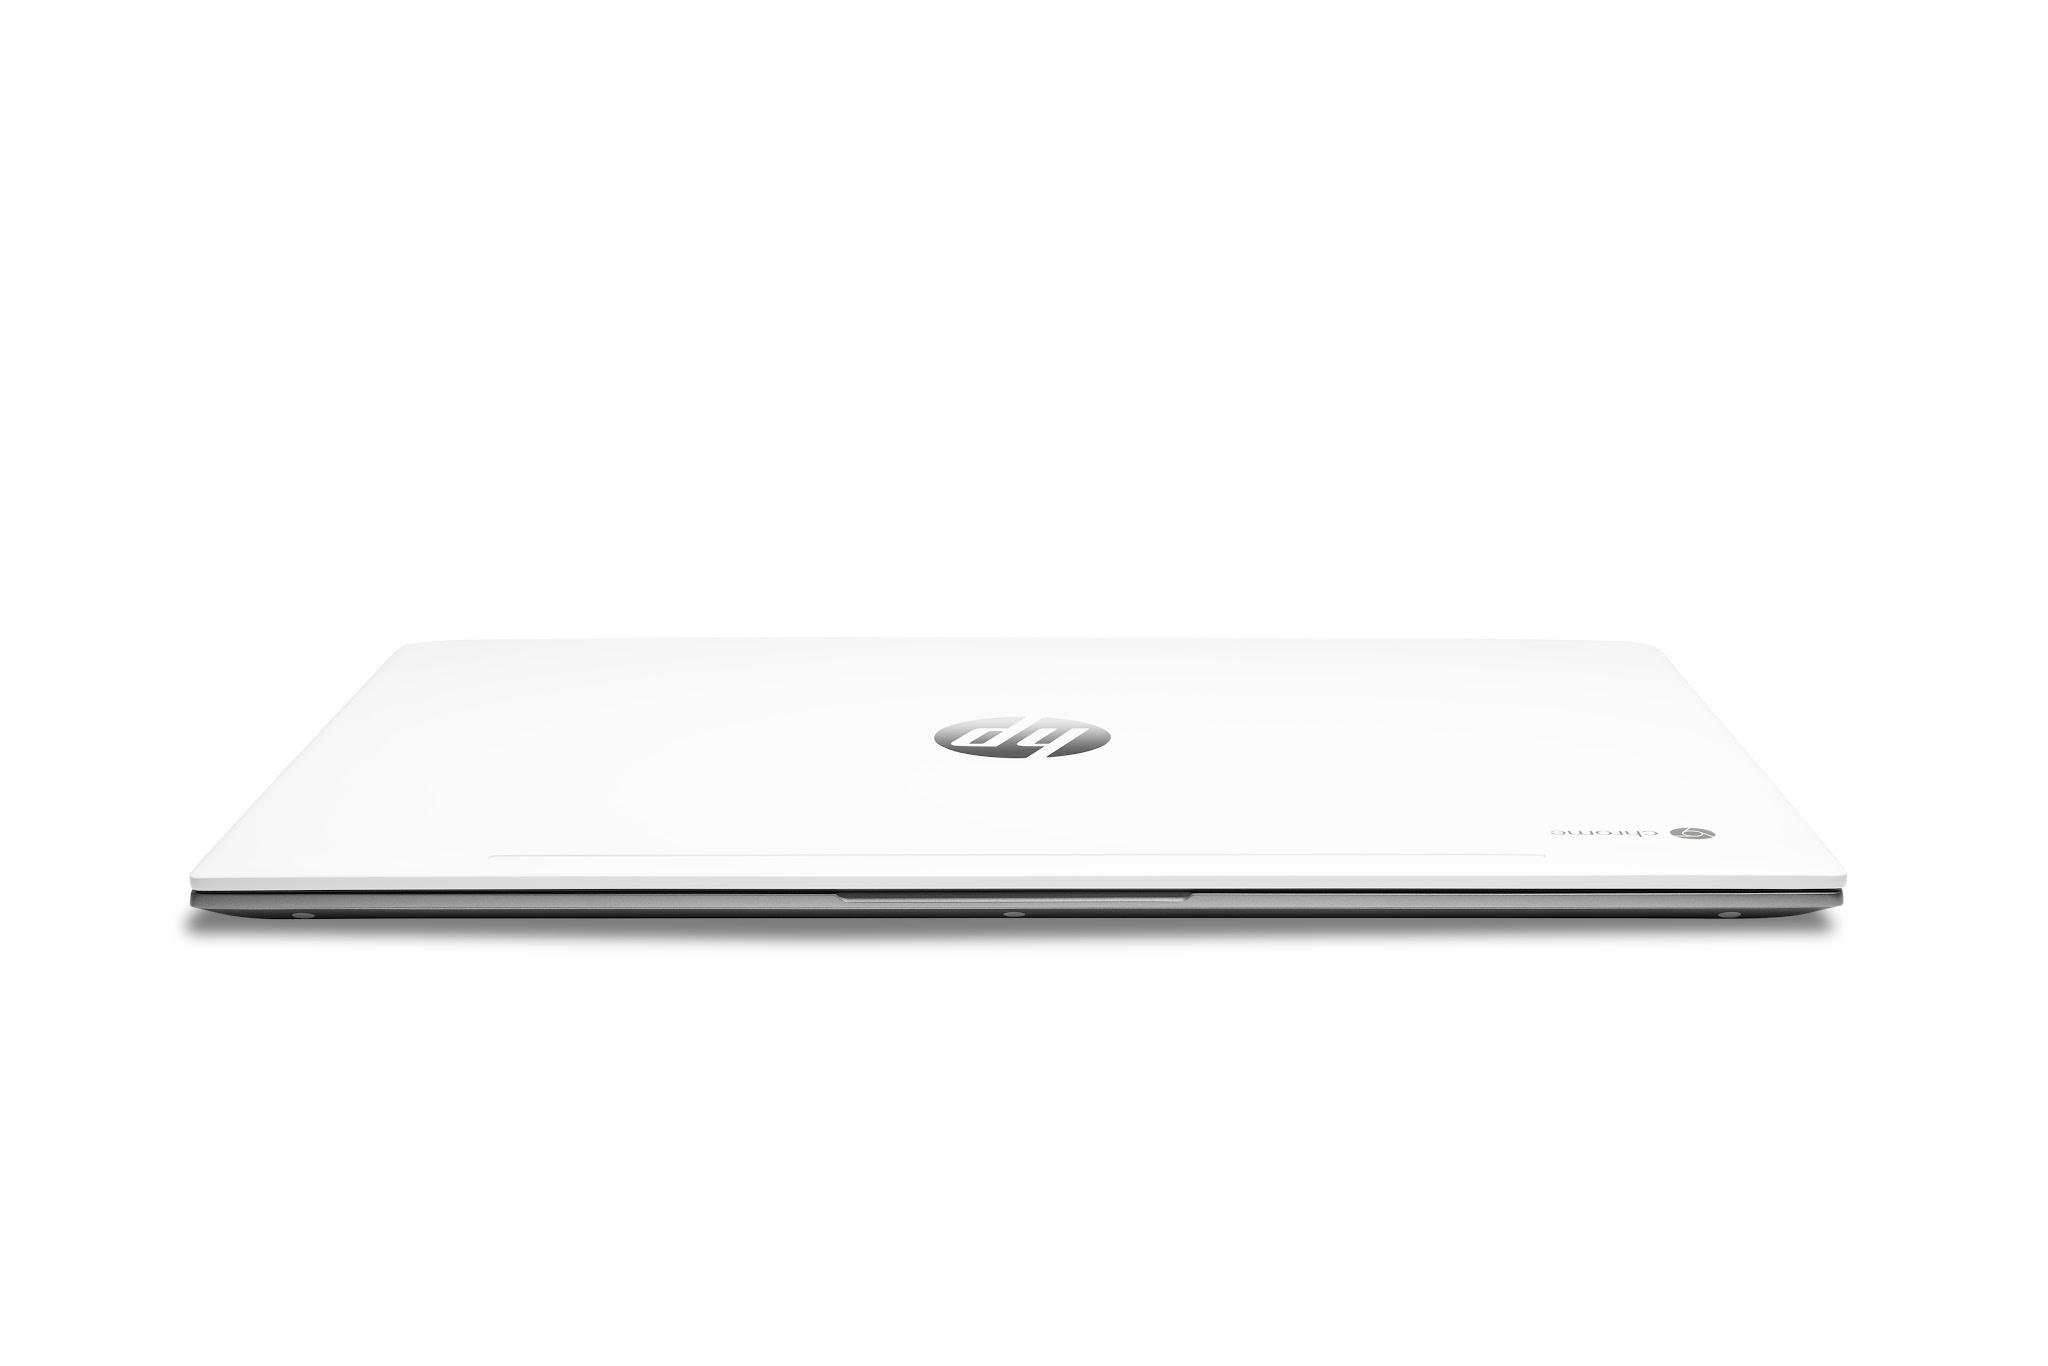 HP Chromebook 15 - photo 11